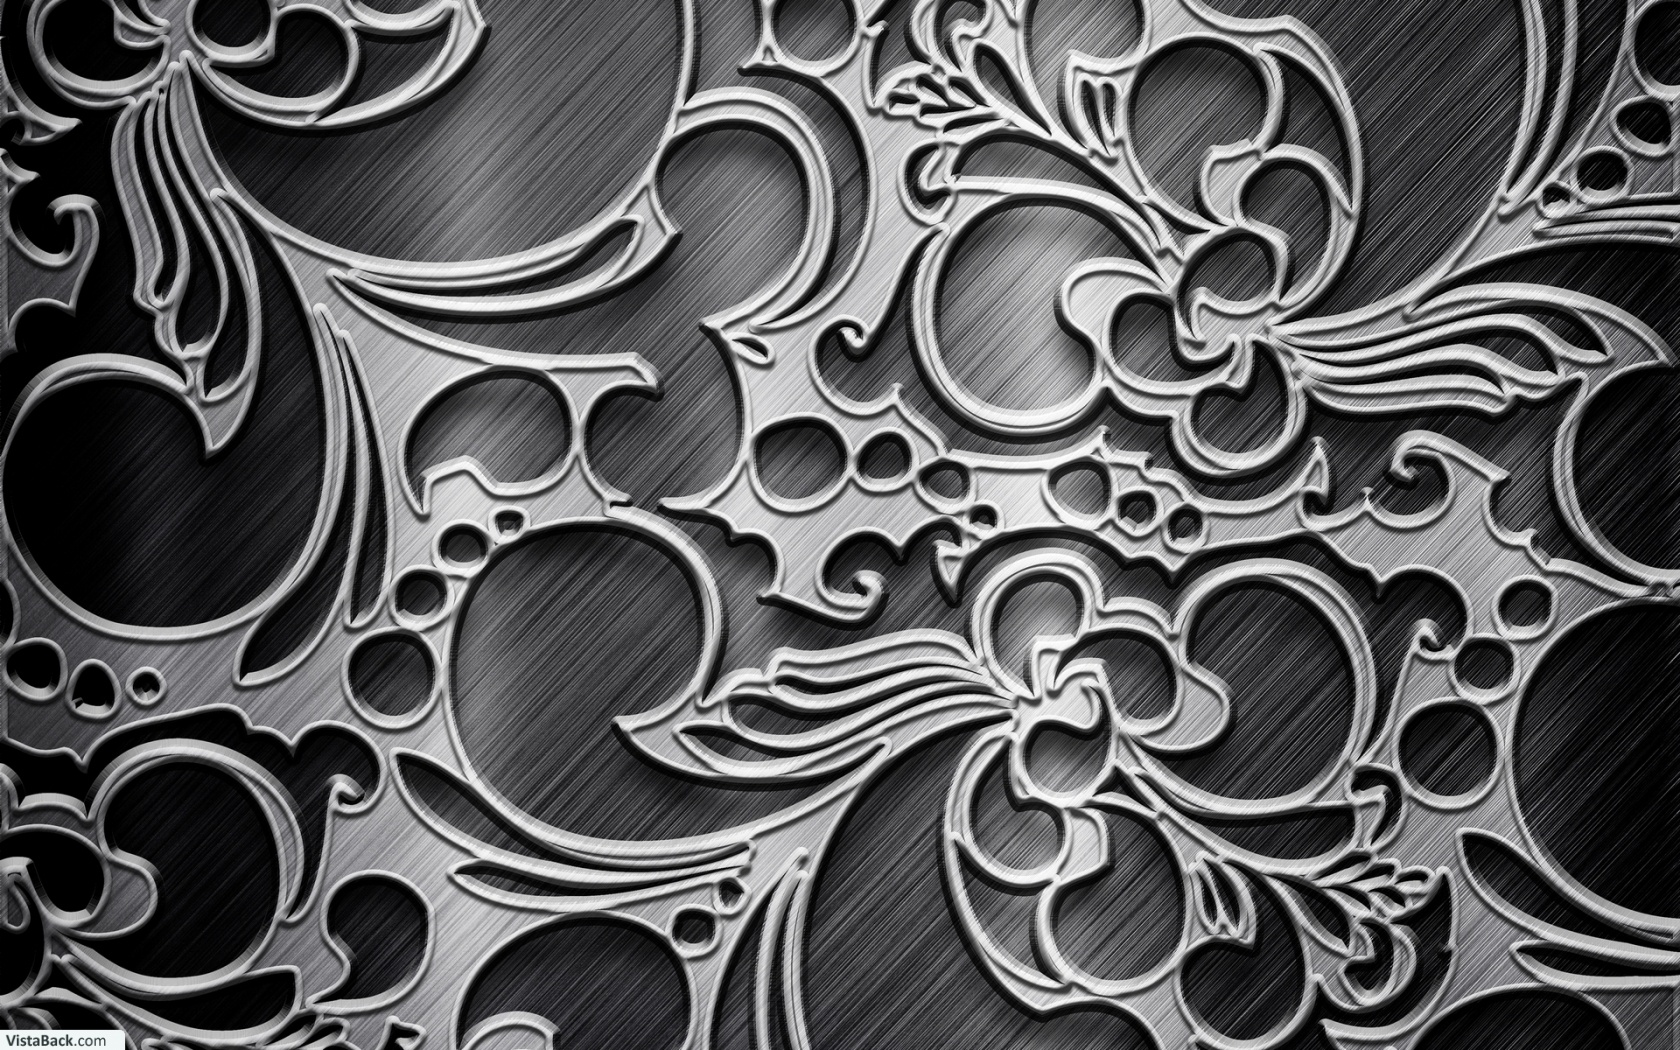 46 Black Silver Hd Wallpaper On Wallpapersafari